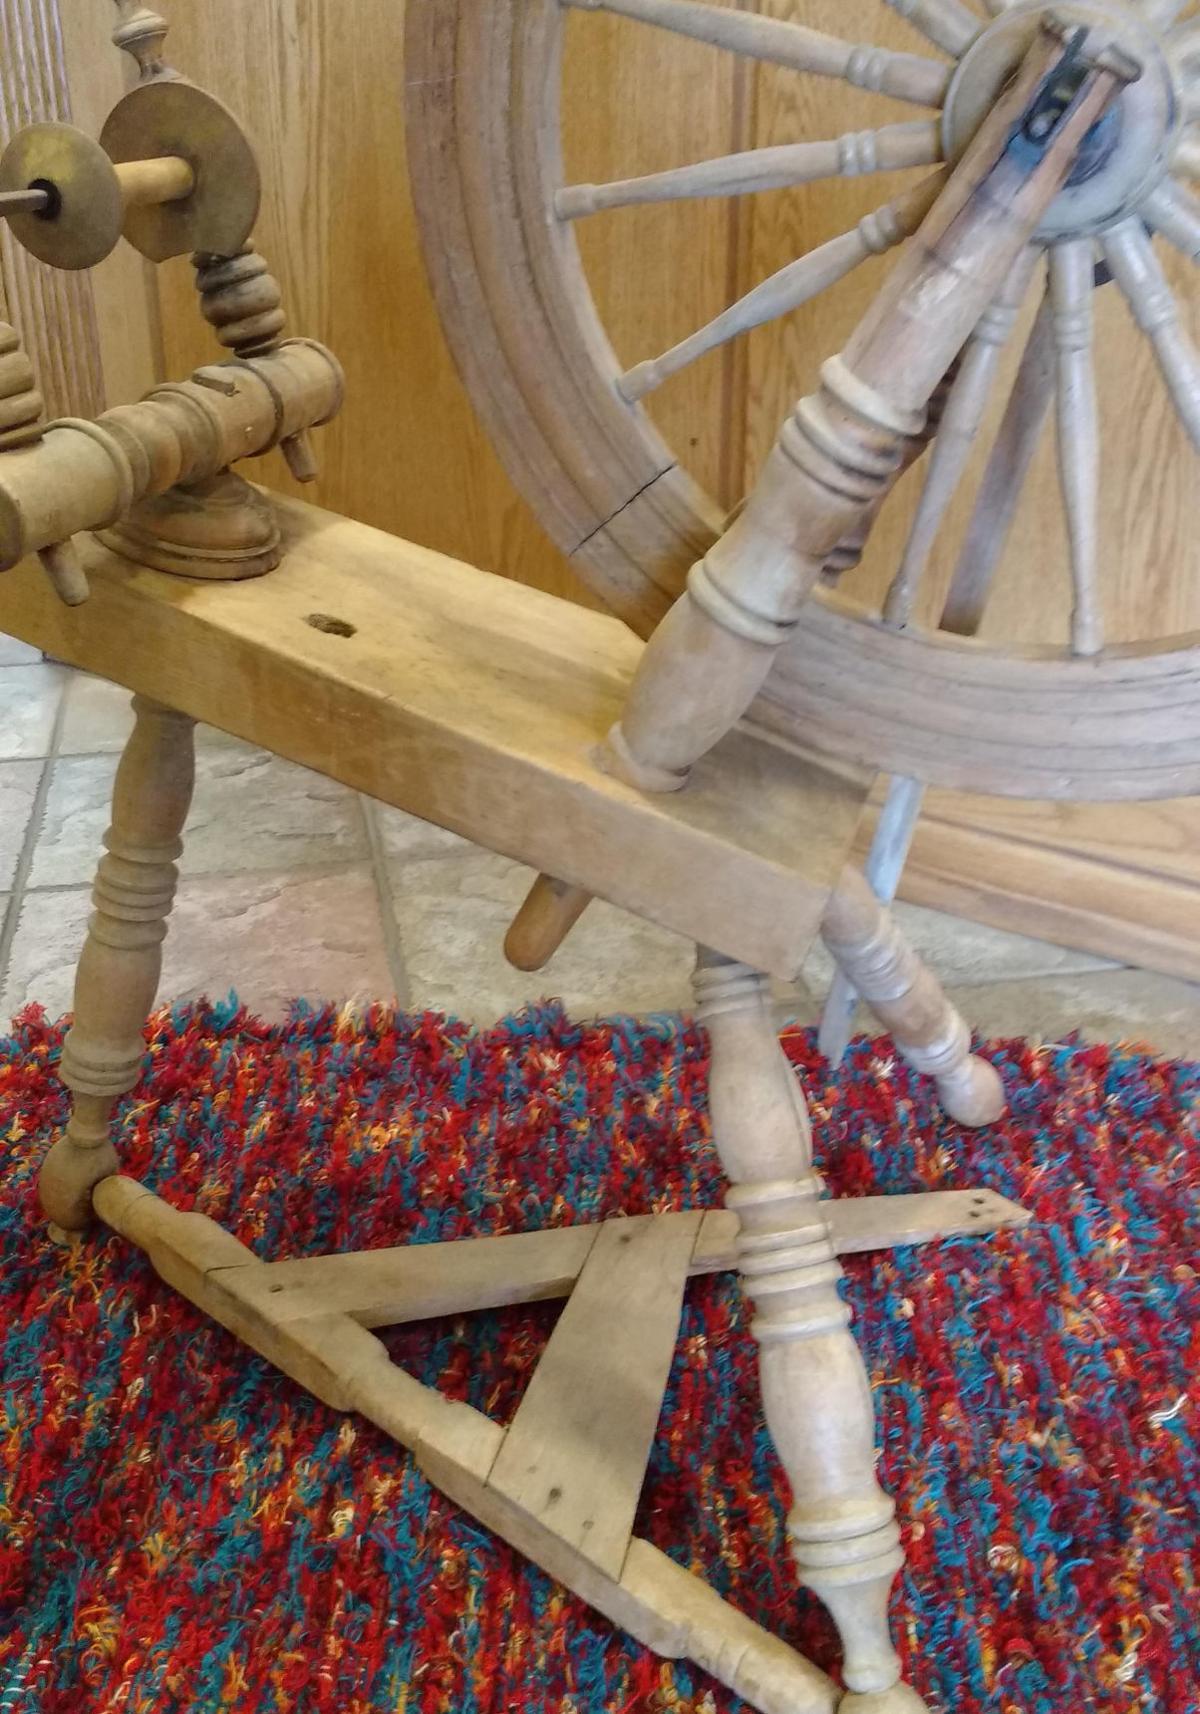 Kelly Oney's spinning wheel